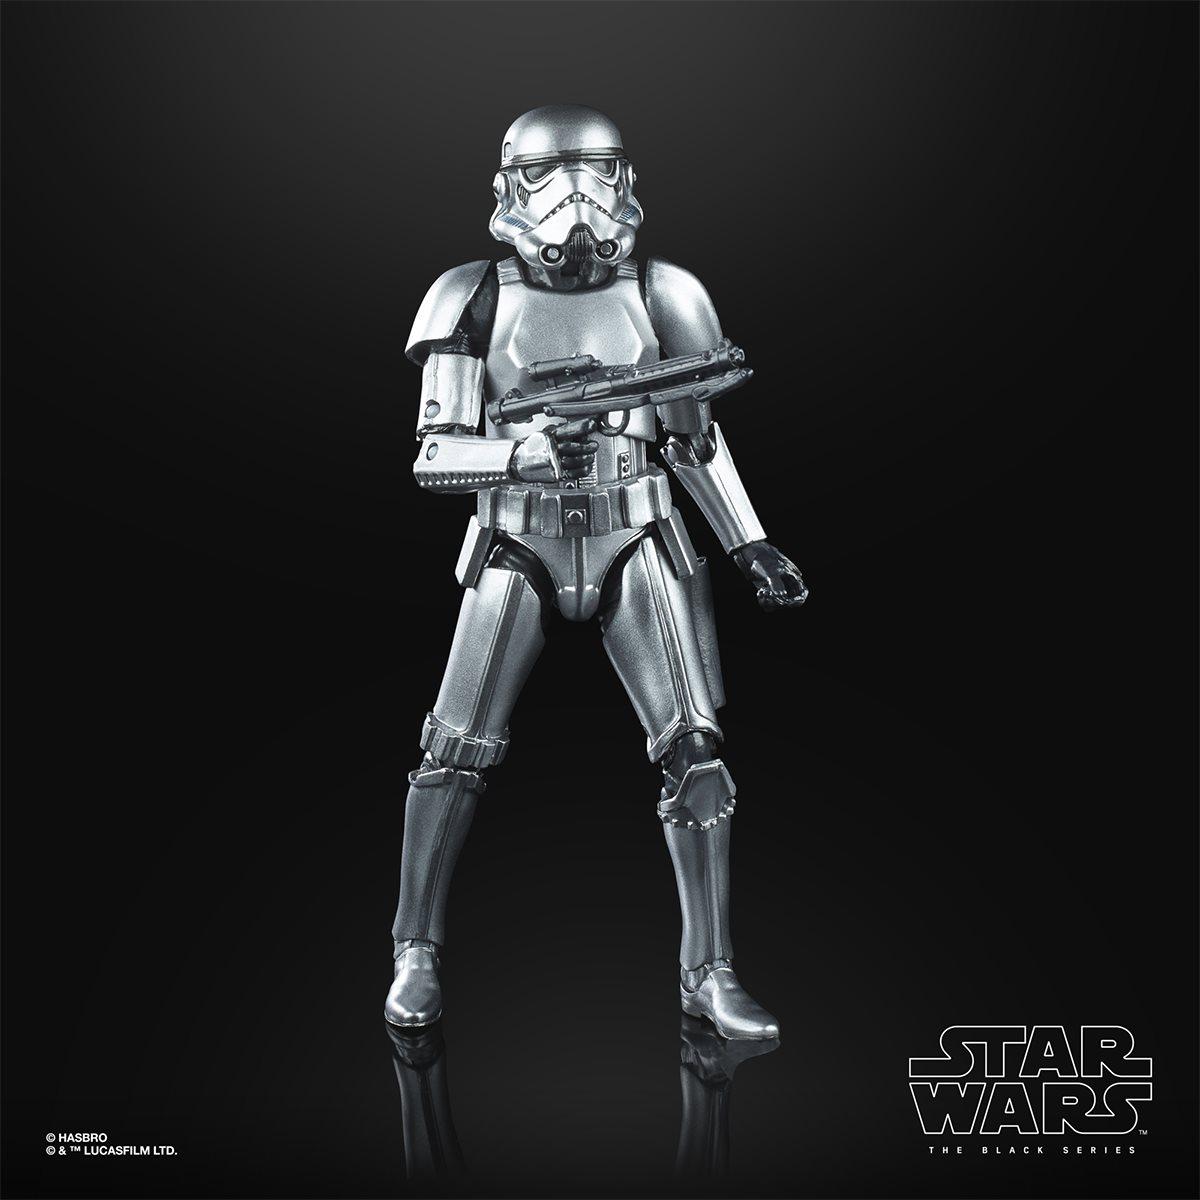 Hasbro PRECO Action Figure Star Wars Black Series Carbonized Stormtrooper